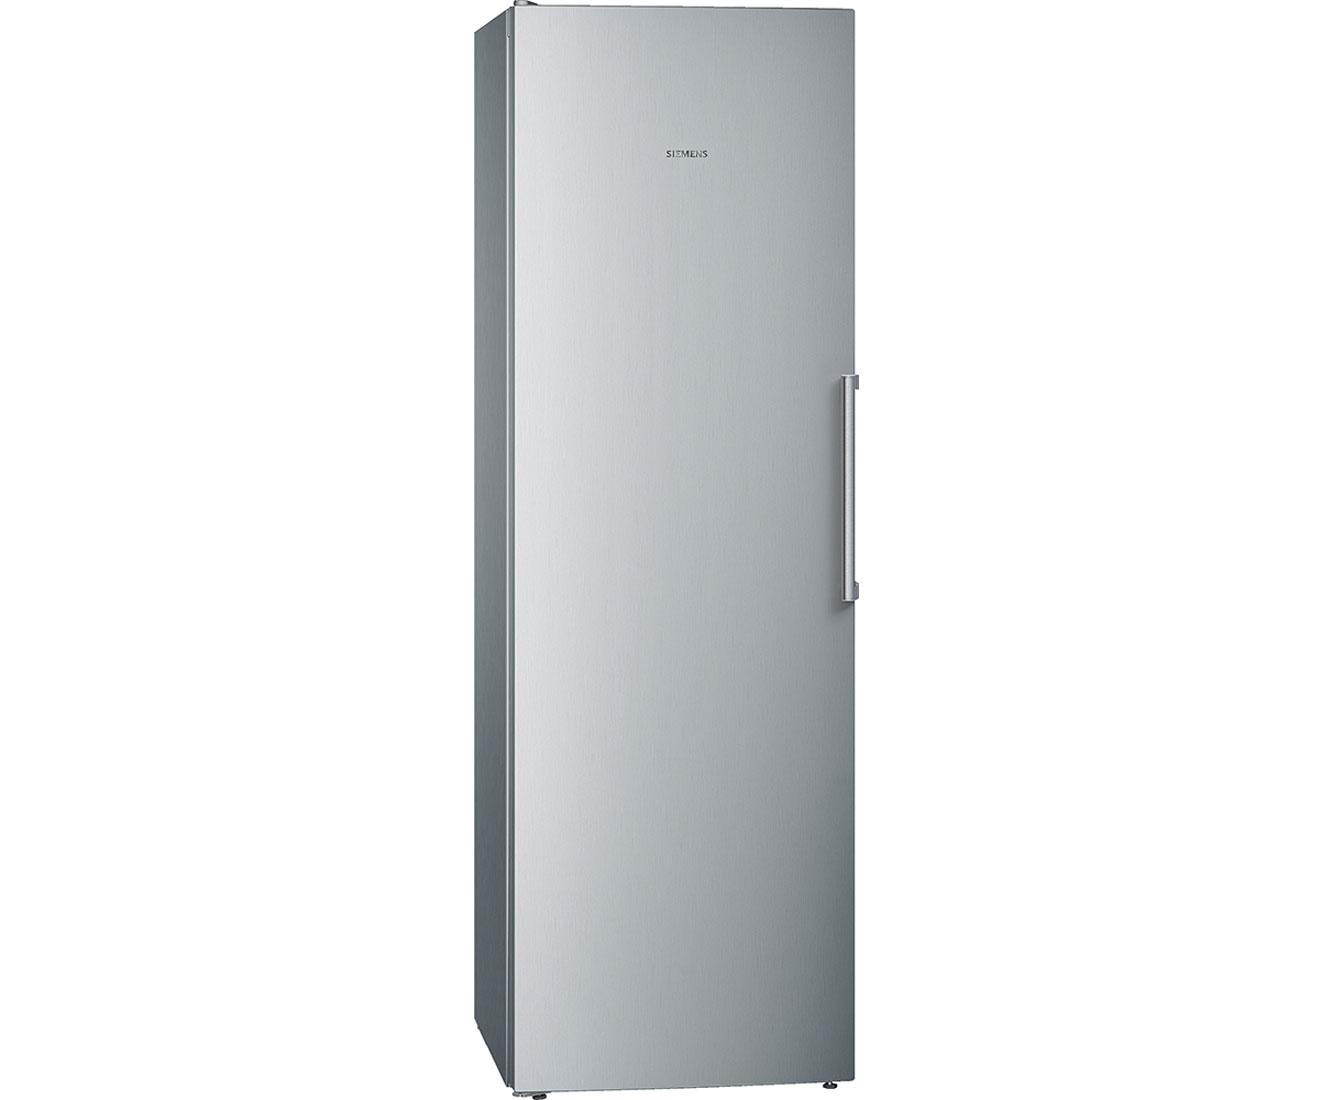 Siemens Kühlschrank Licht Geht Nicht Aus : Siemens ks36vvi30 kühlschrank edelstahl a